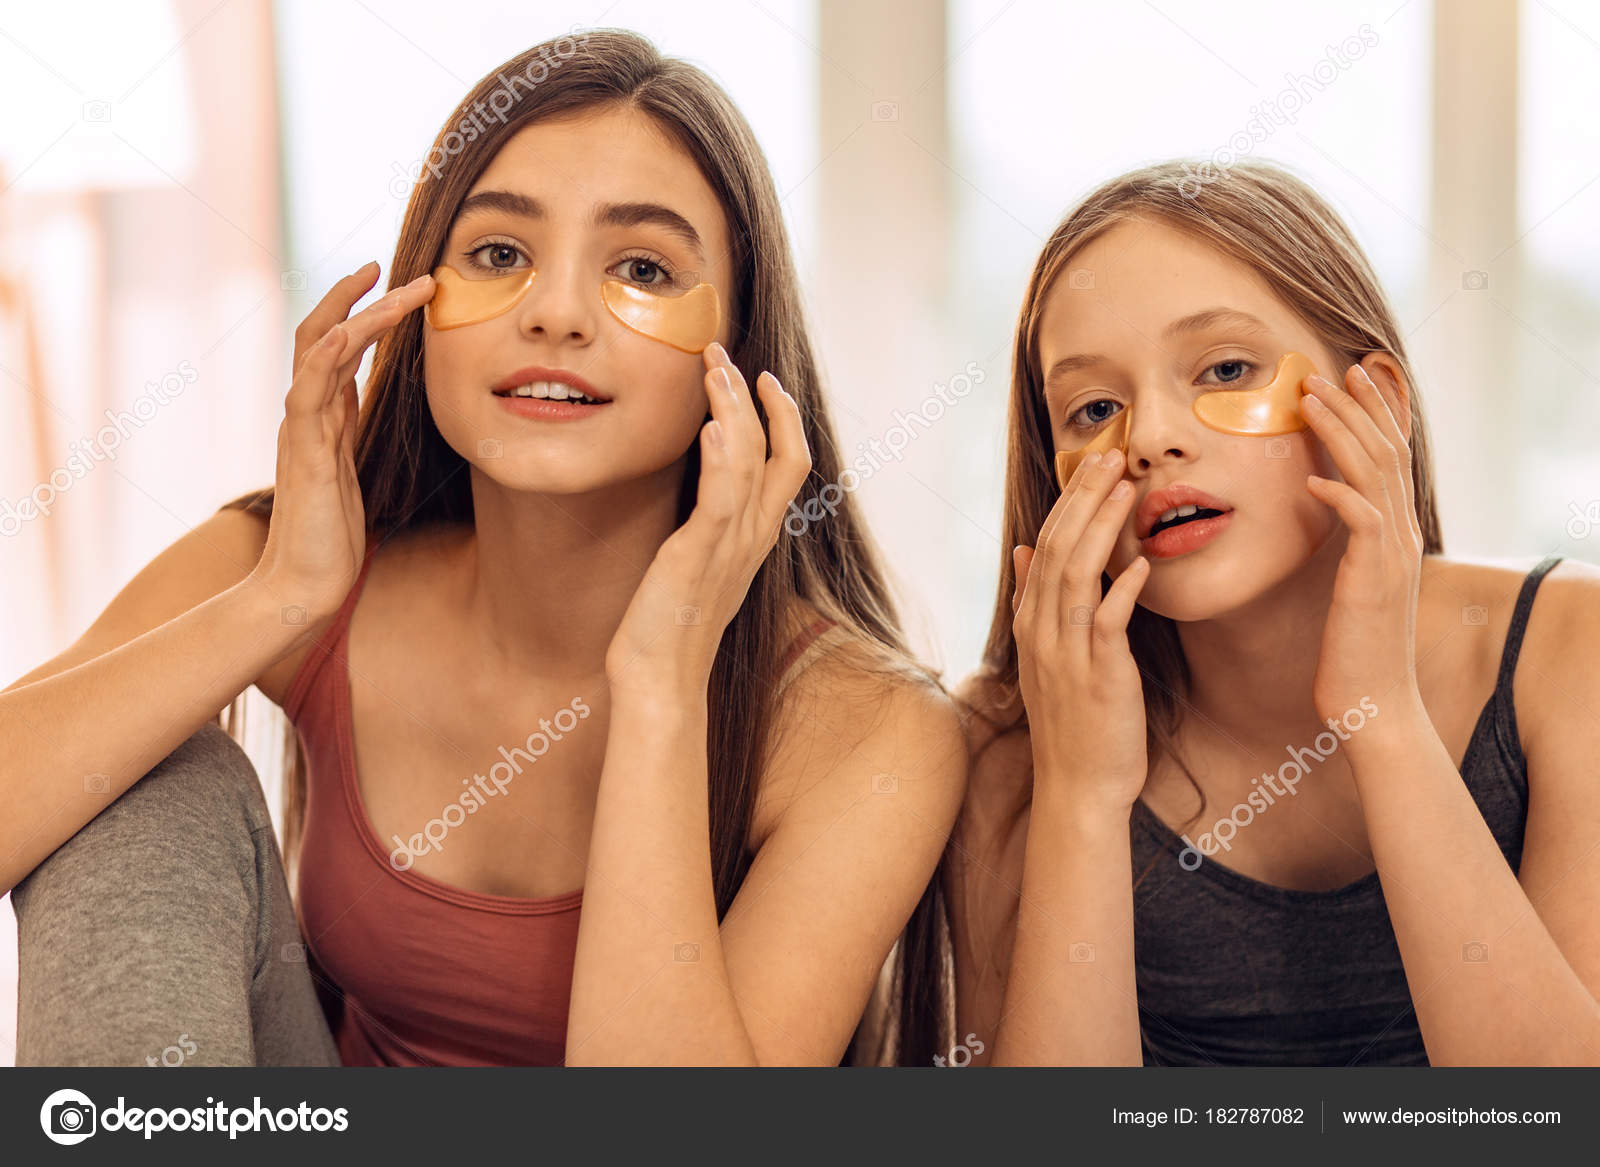 bellissime ragazze adolescenti nude